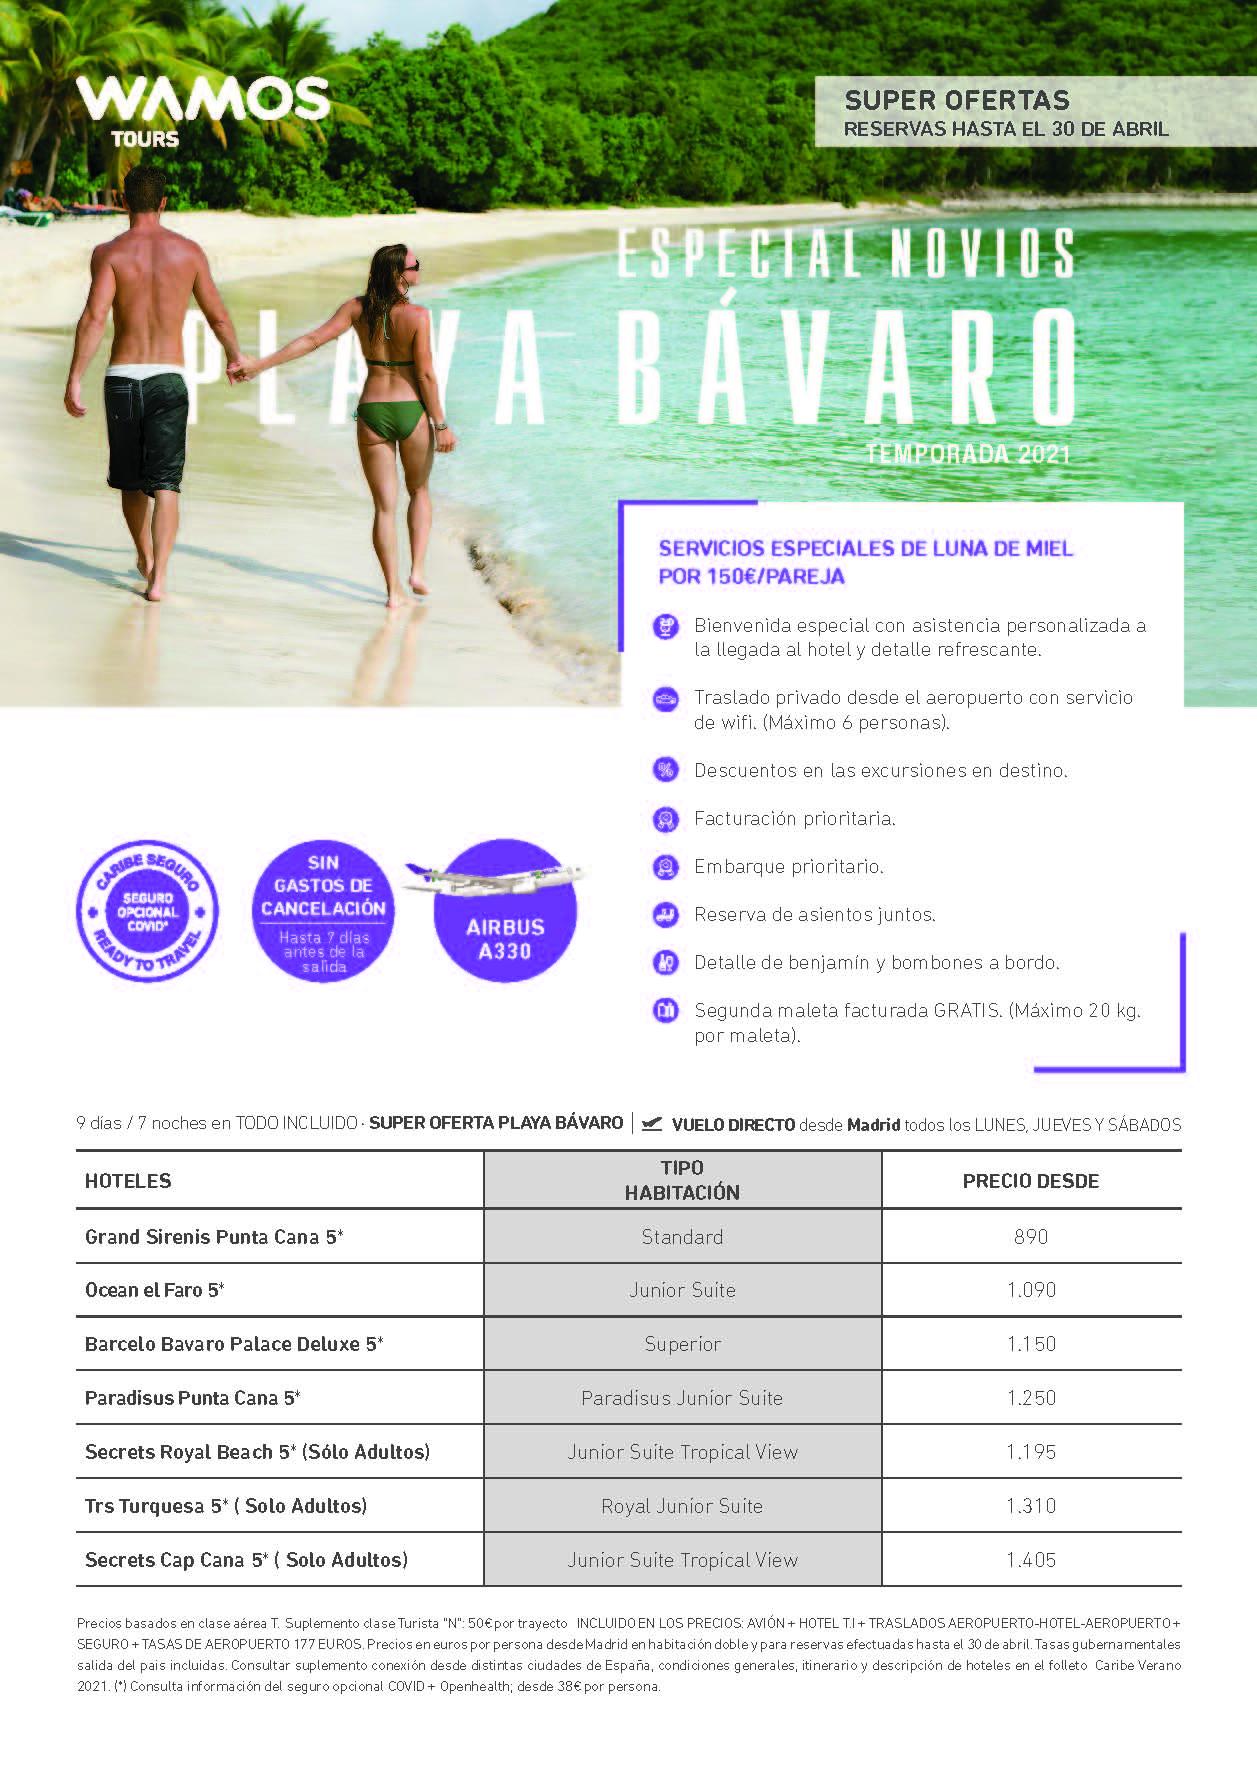 Oferta Wamos Tours Servicios Especiales Novios Punta Cana Verano 2021